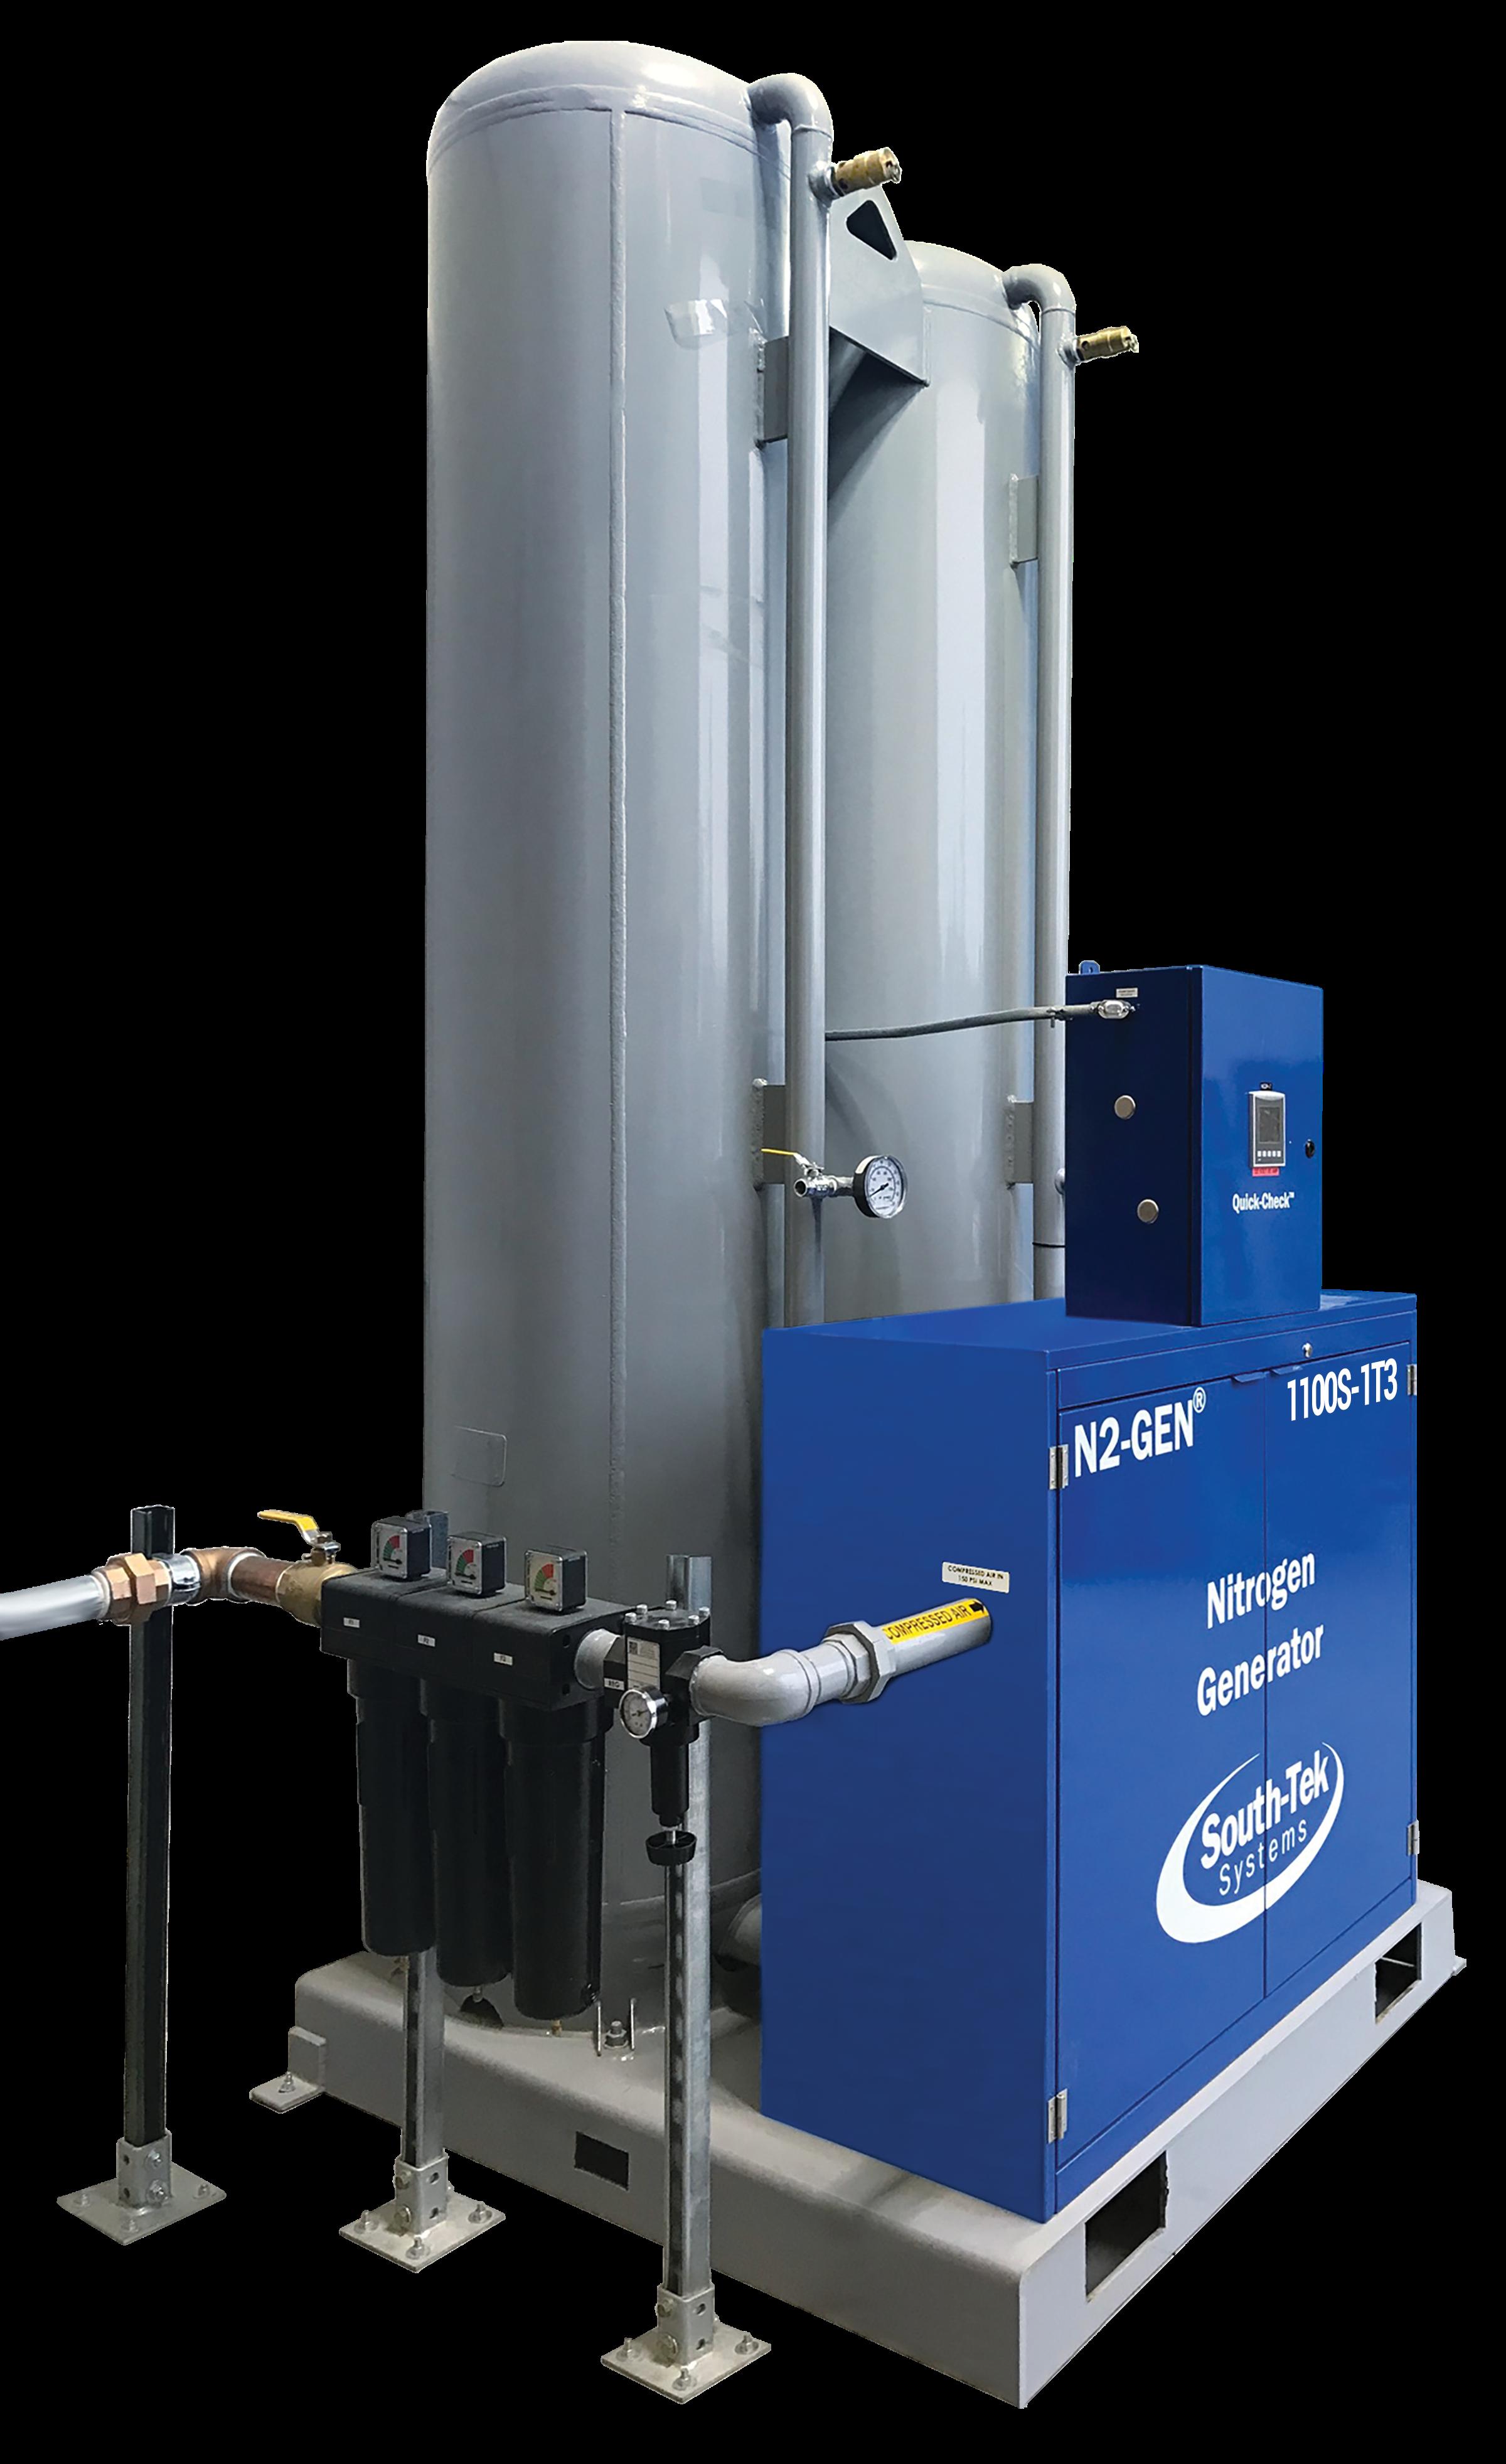 South-Tek Systems Nitrogen Generator